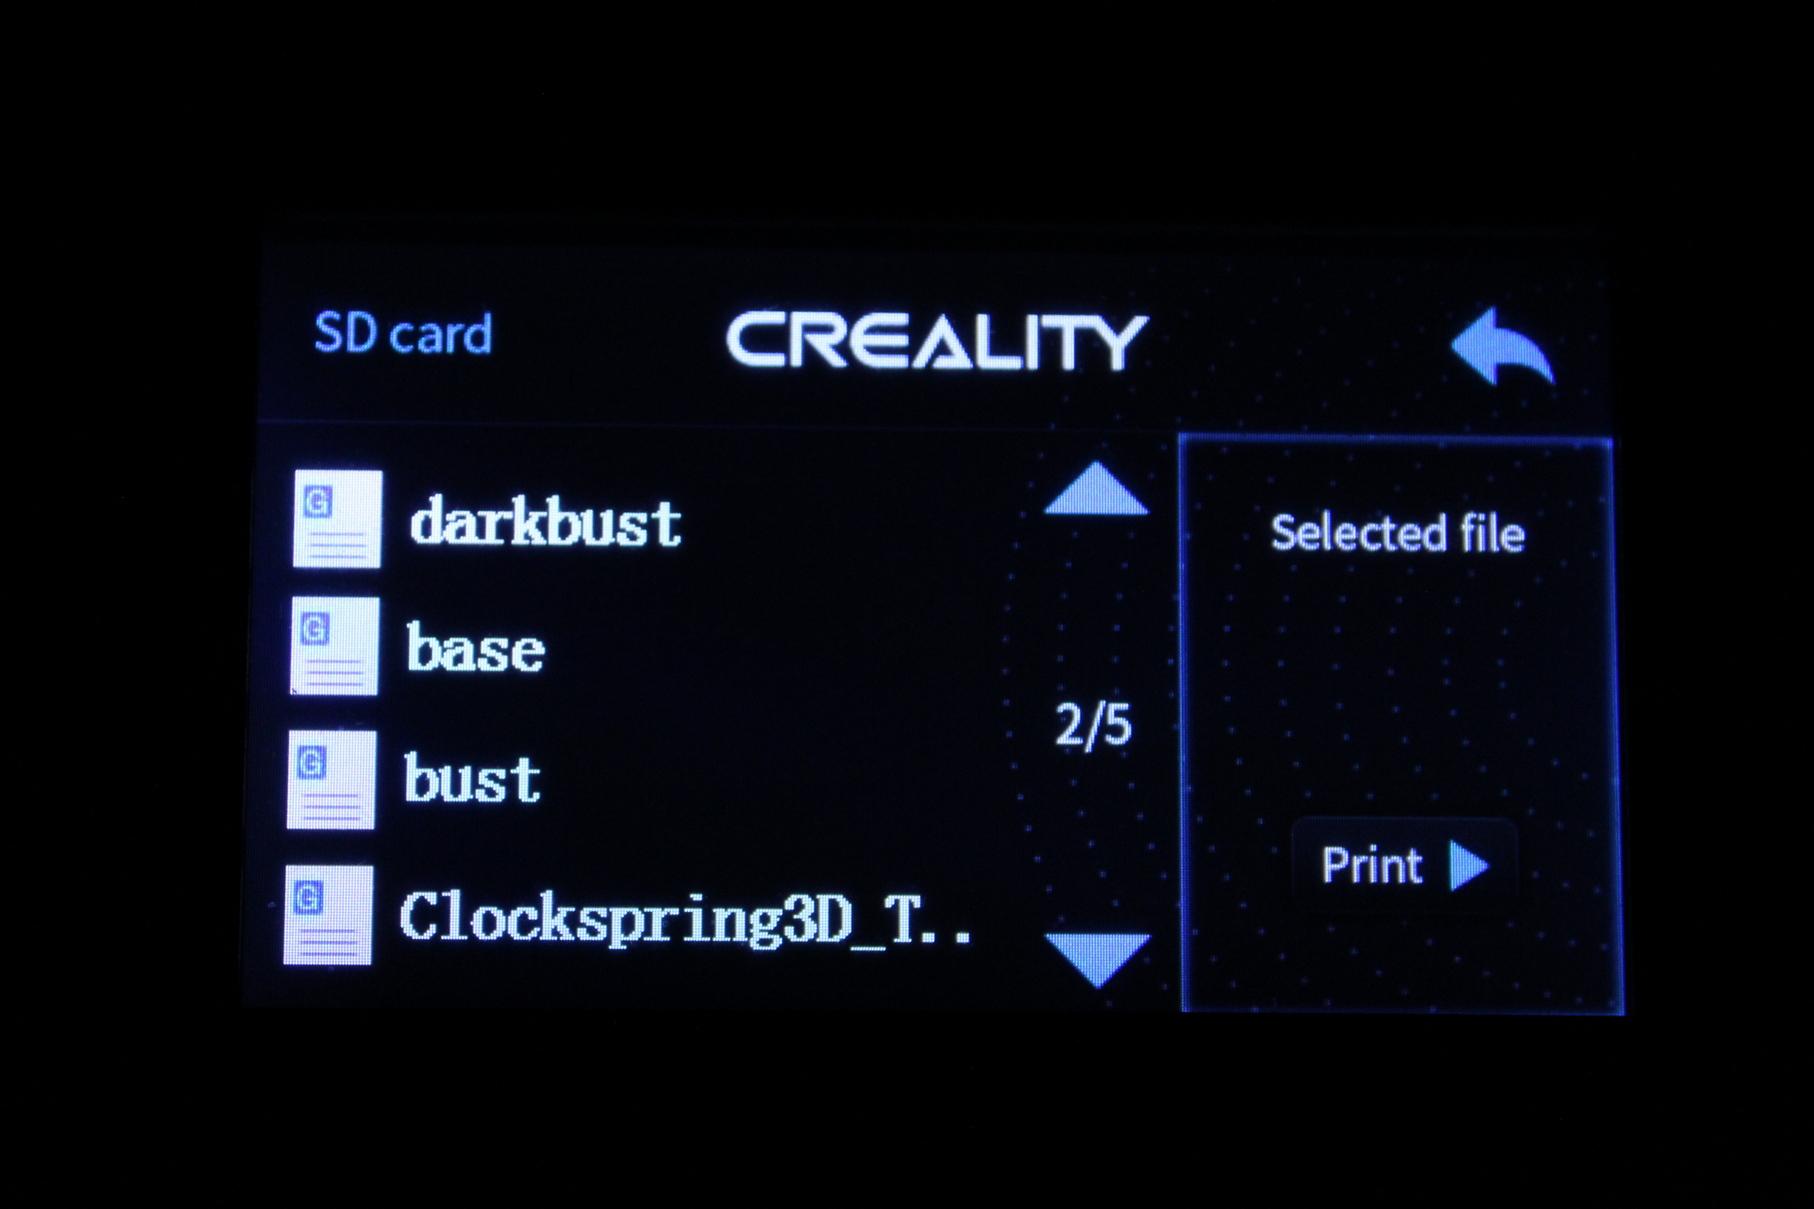 Creality-Sermoon-D1-TFT-Screen-Interface-9